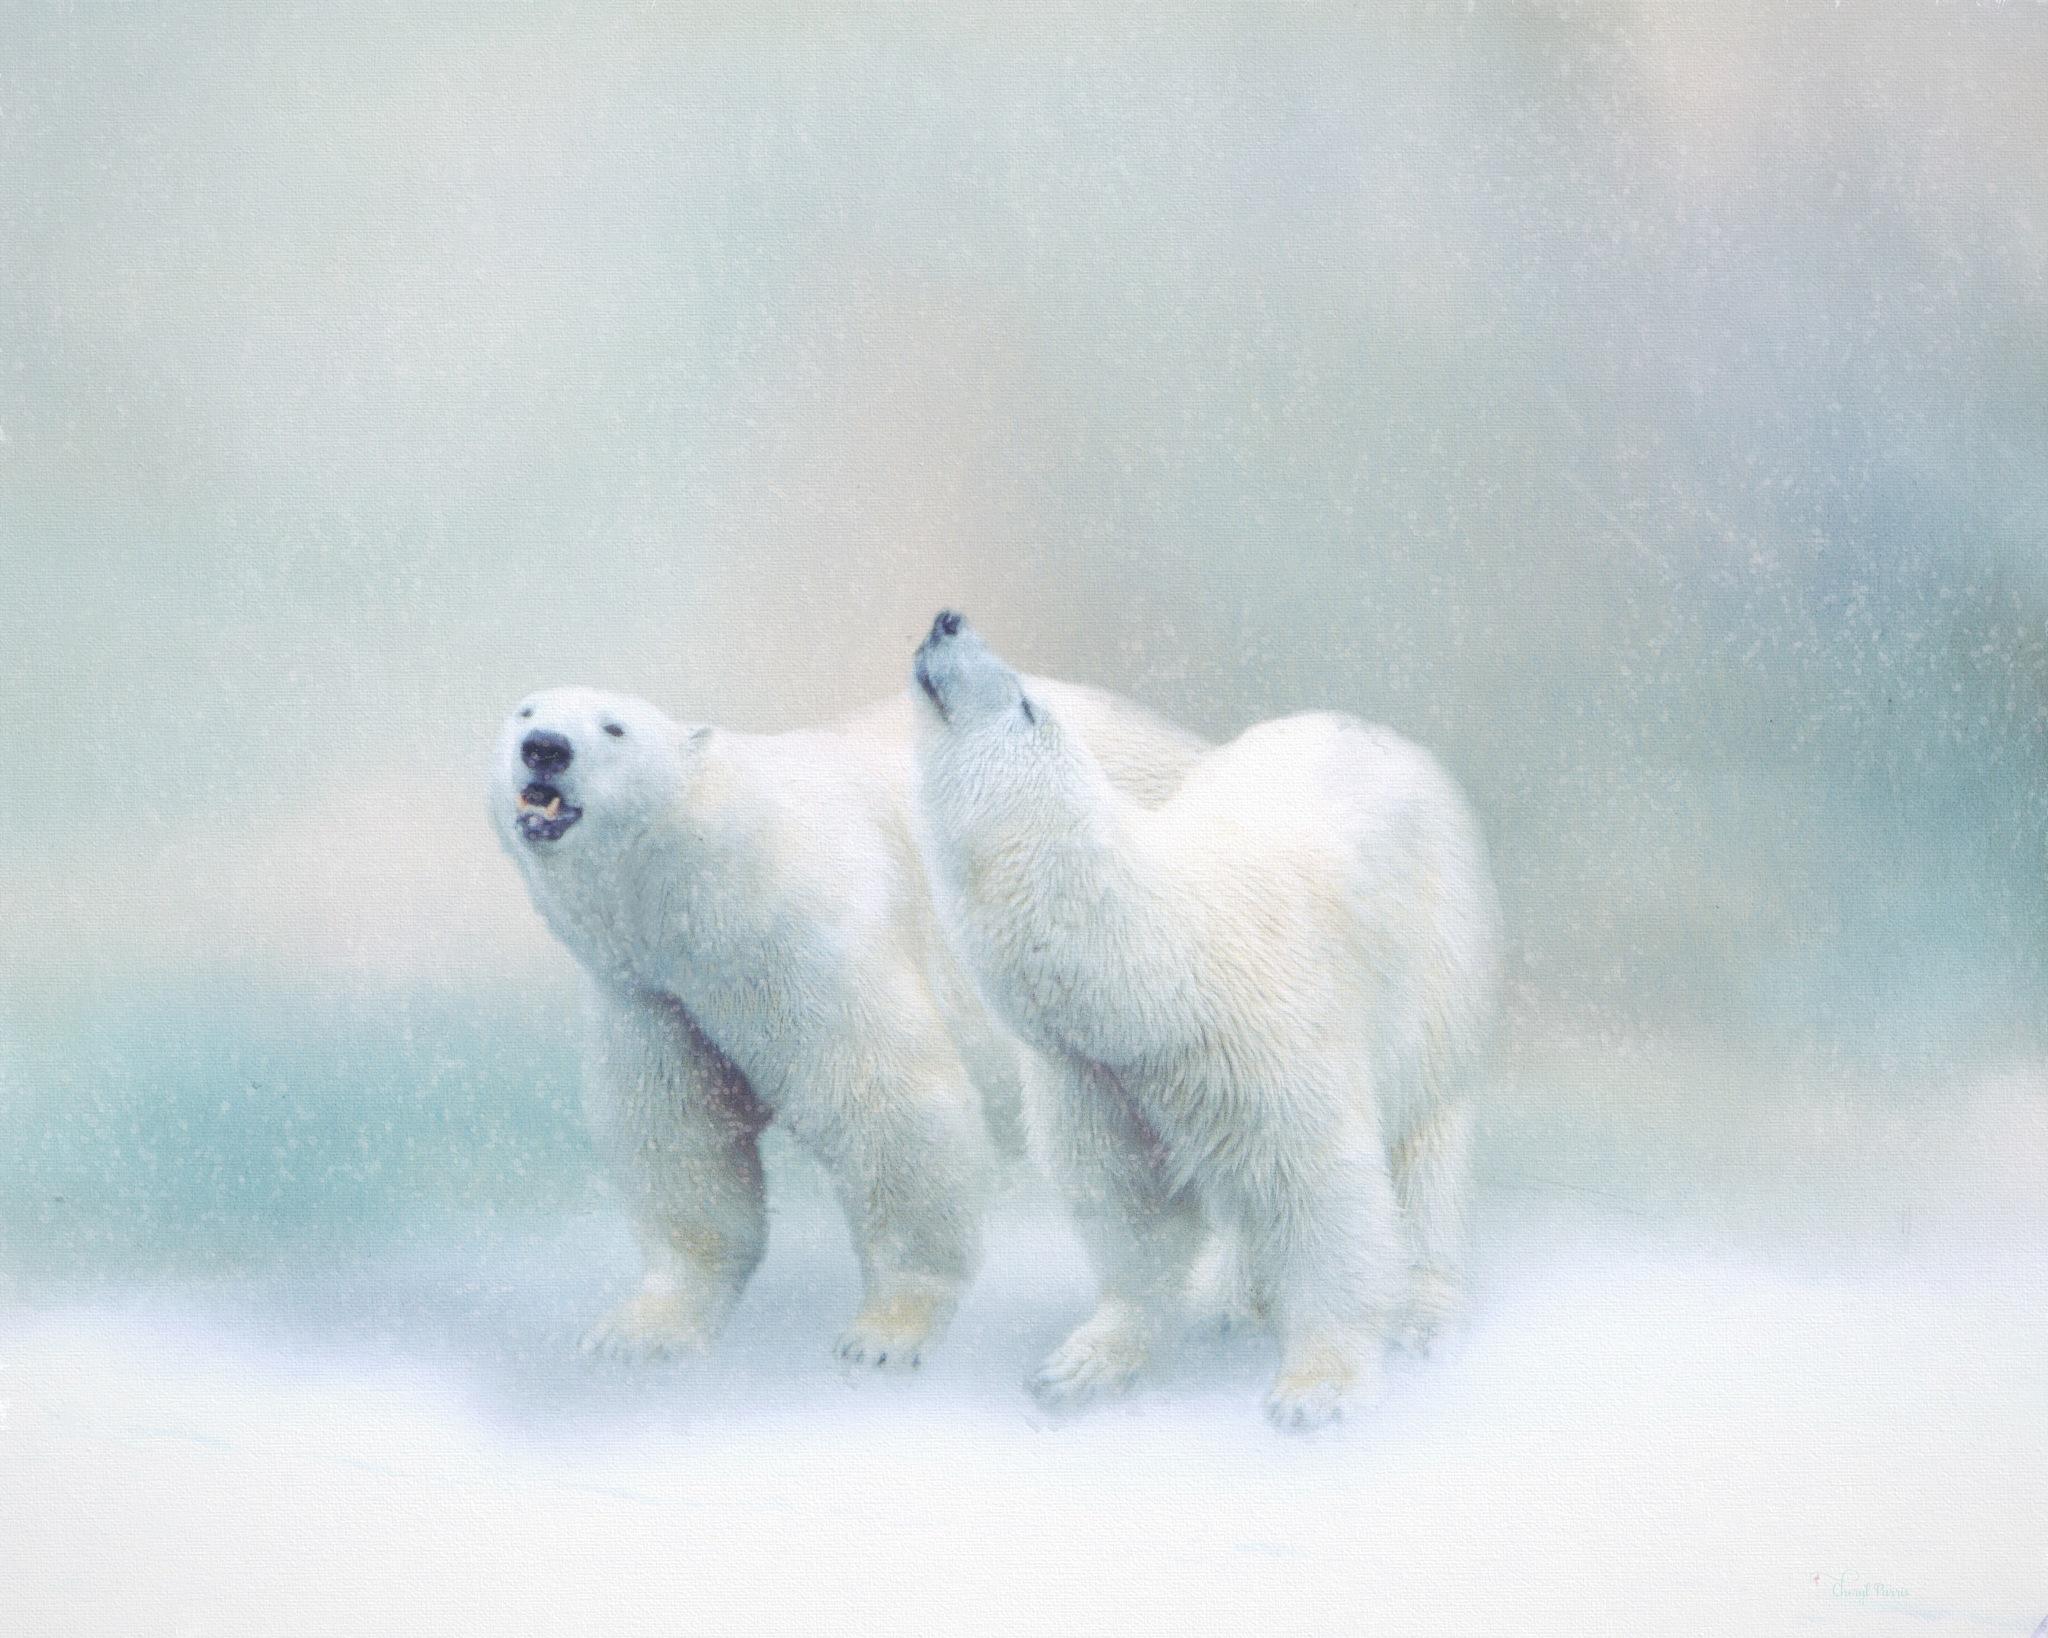 Yay!  It's Snowing! by Cherbeni